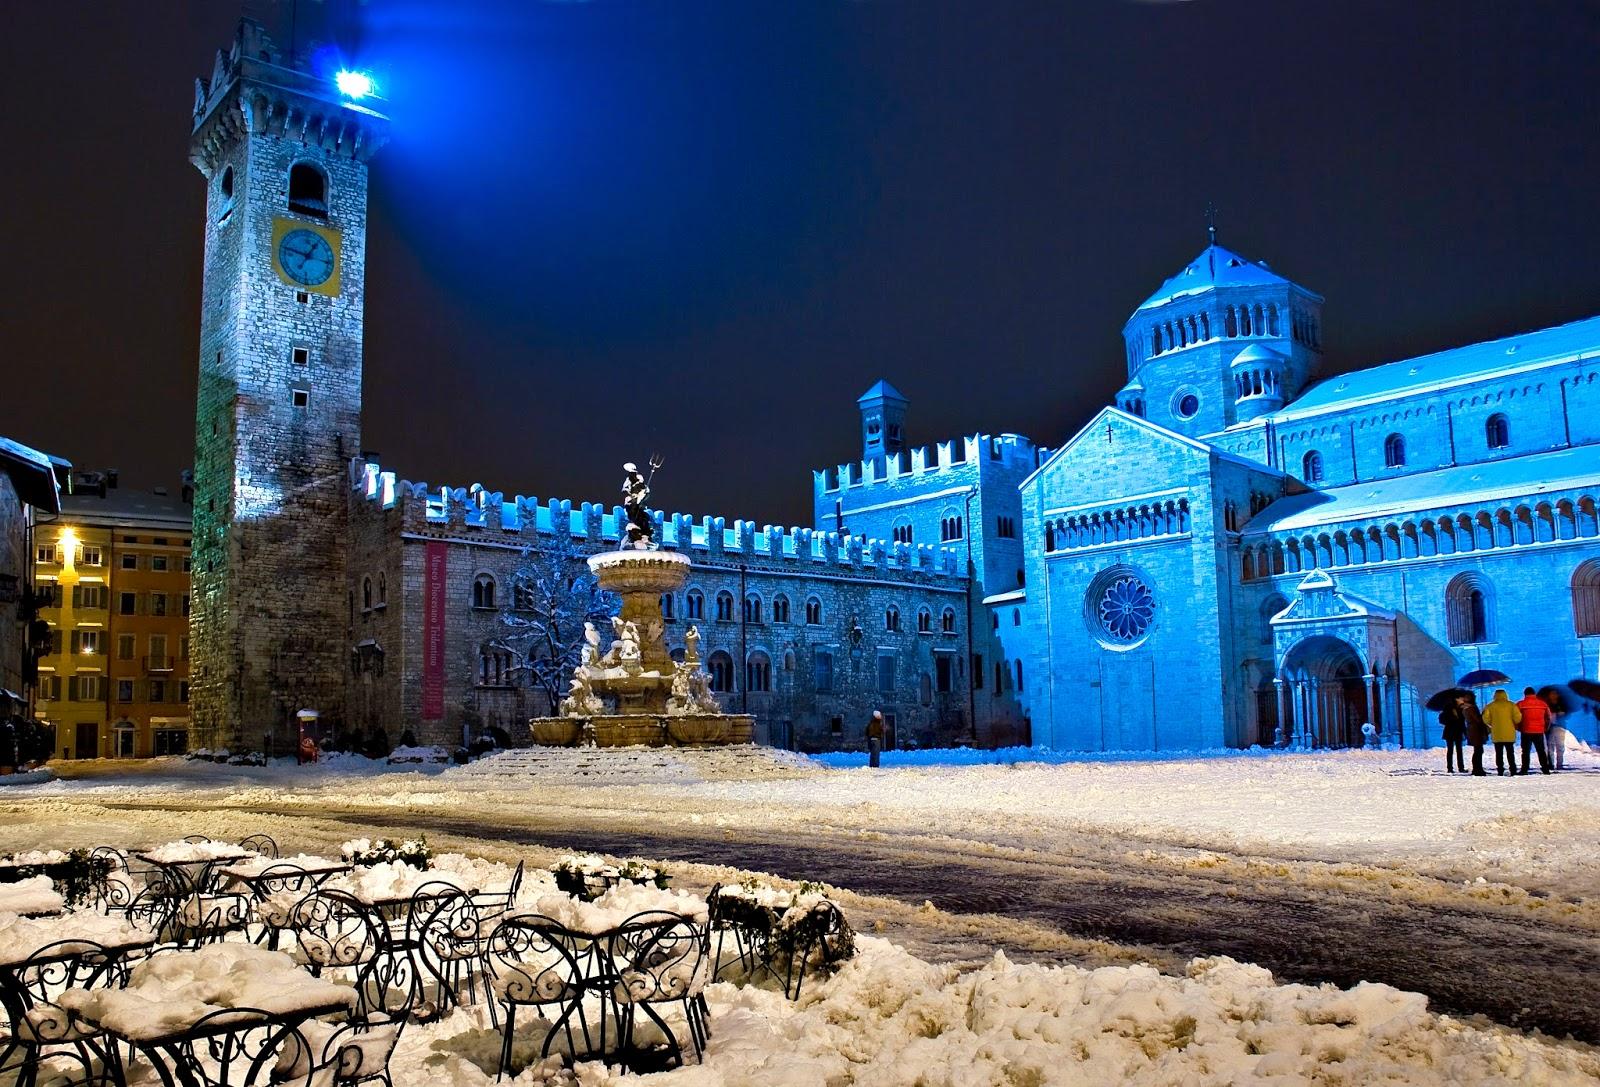 Turismo en Trento-Italia.Turismo en  Madrid con Paloma y Javier